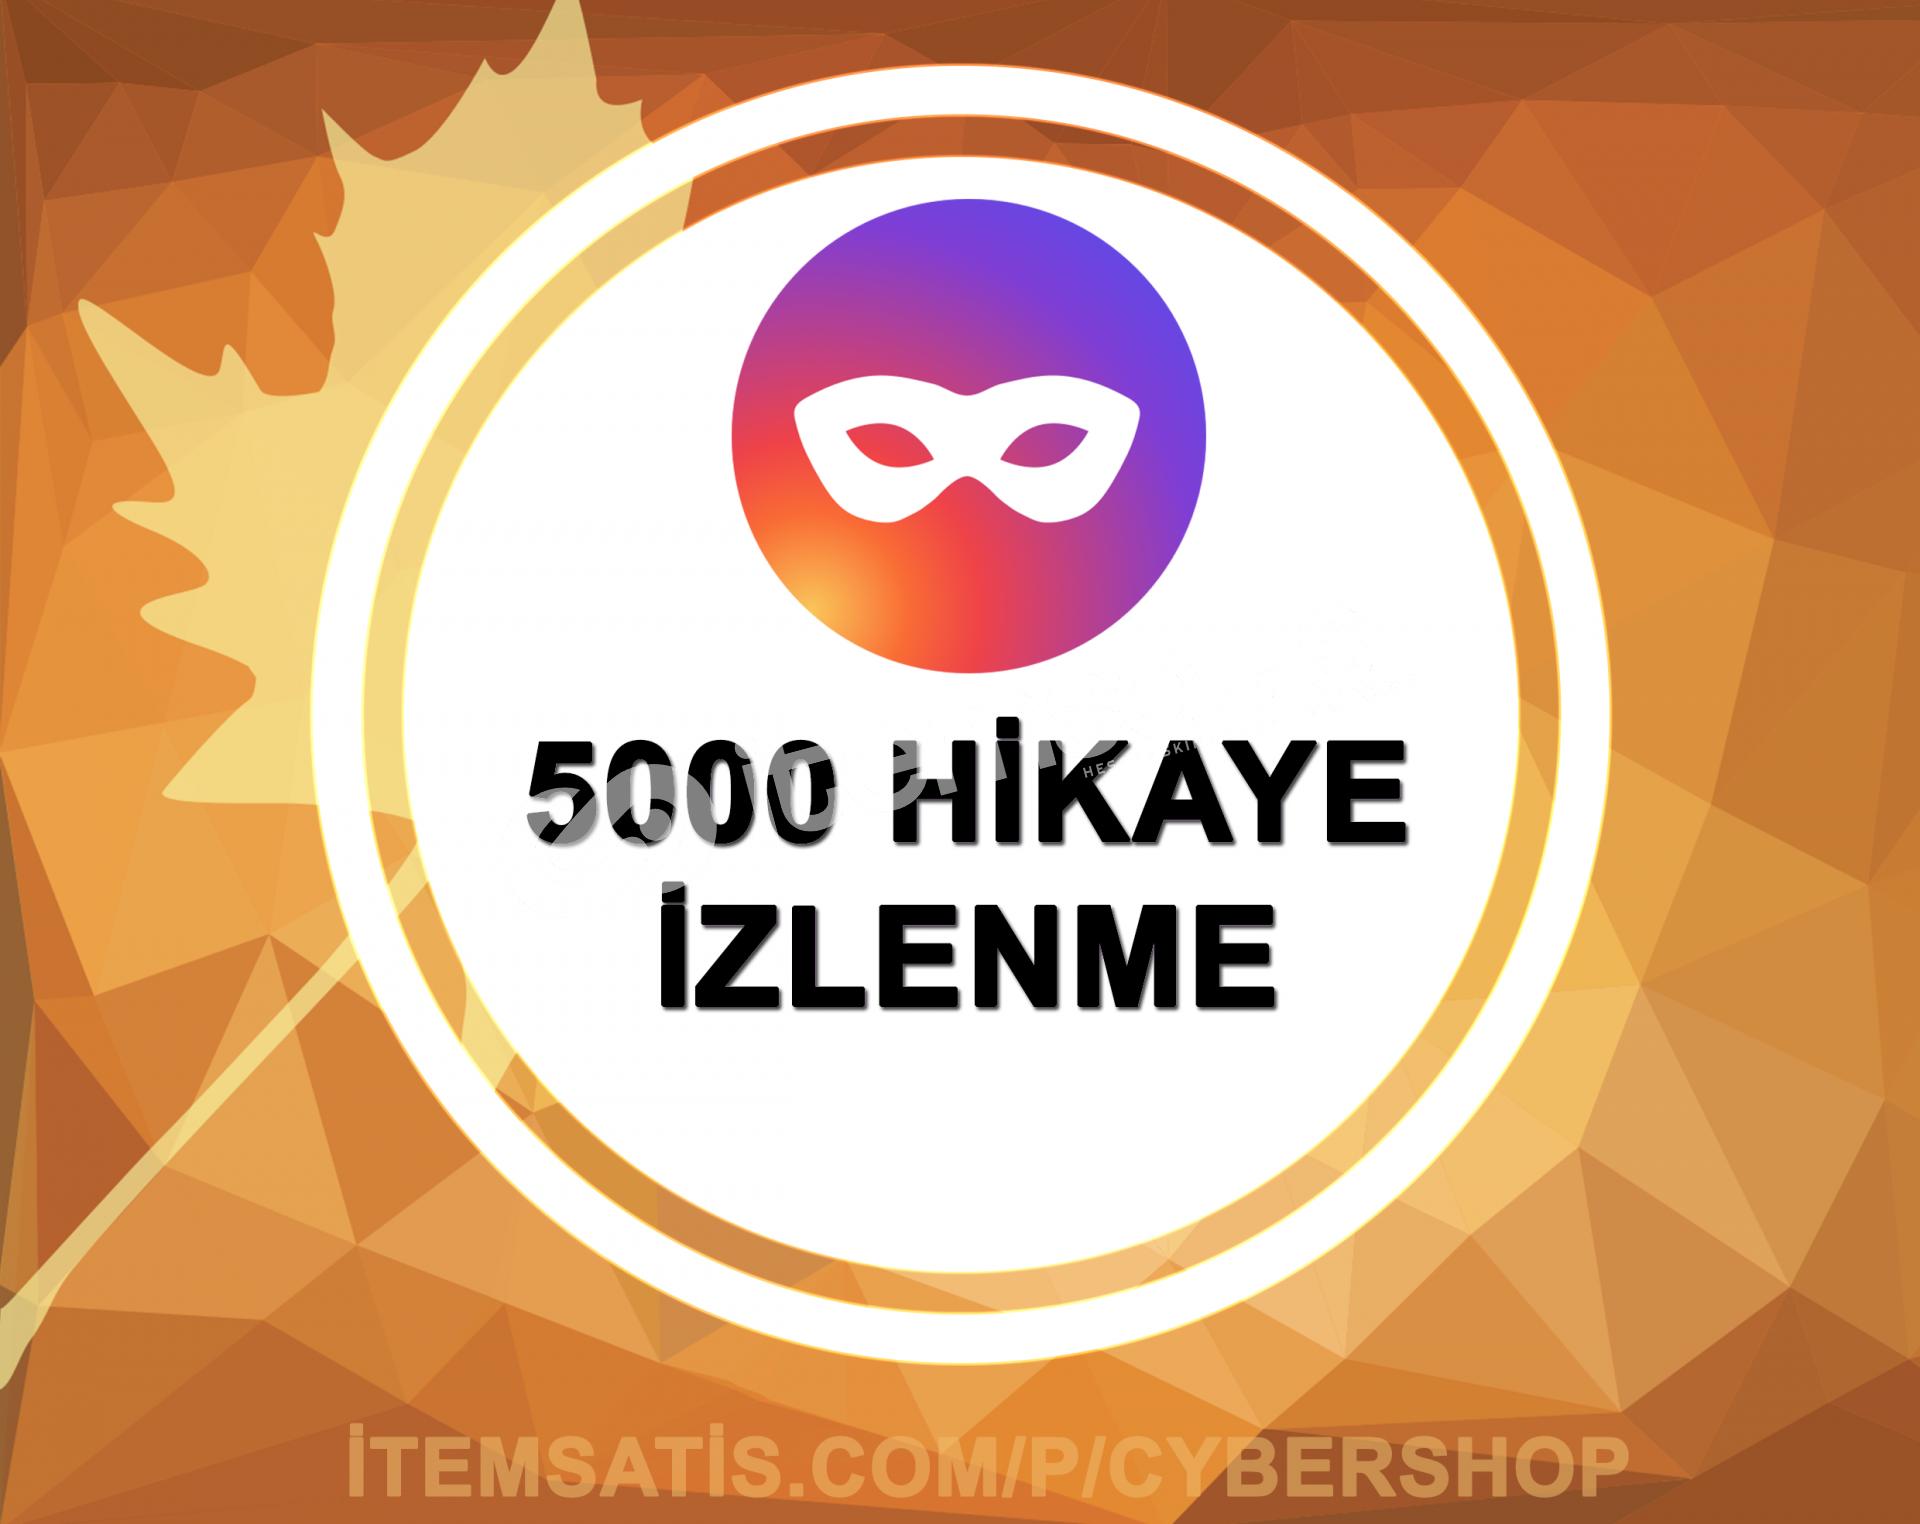 3000 Hikaye İzlenme (Tüm Hikayeler)